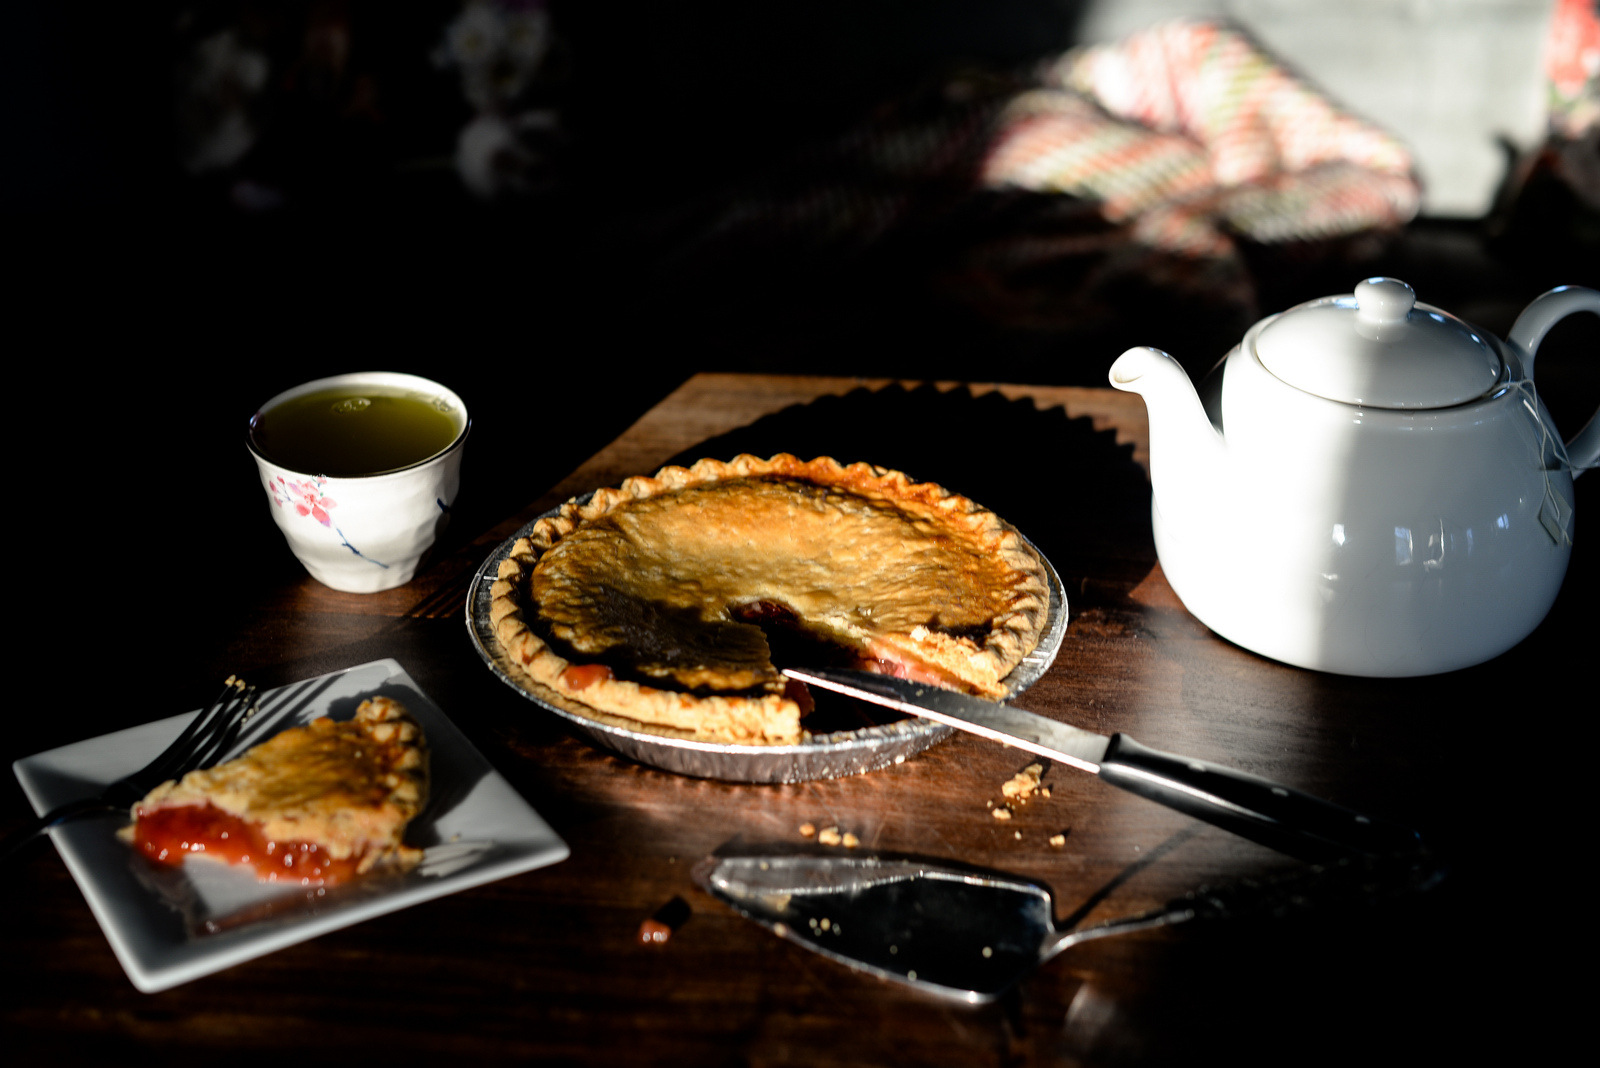 pie and light